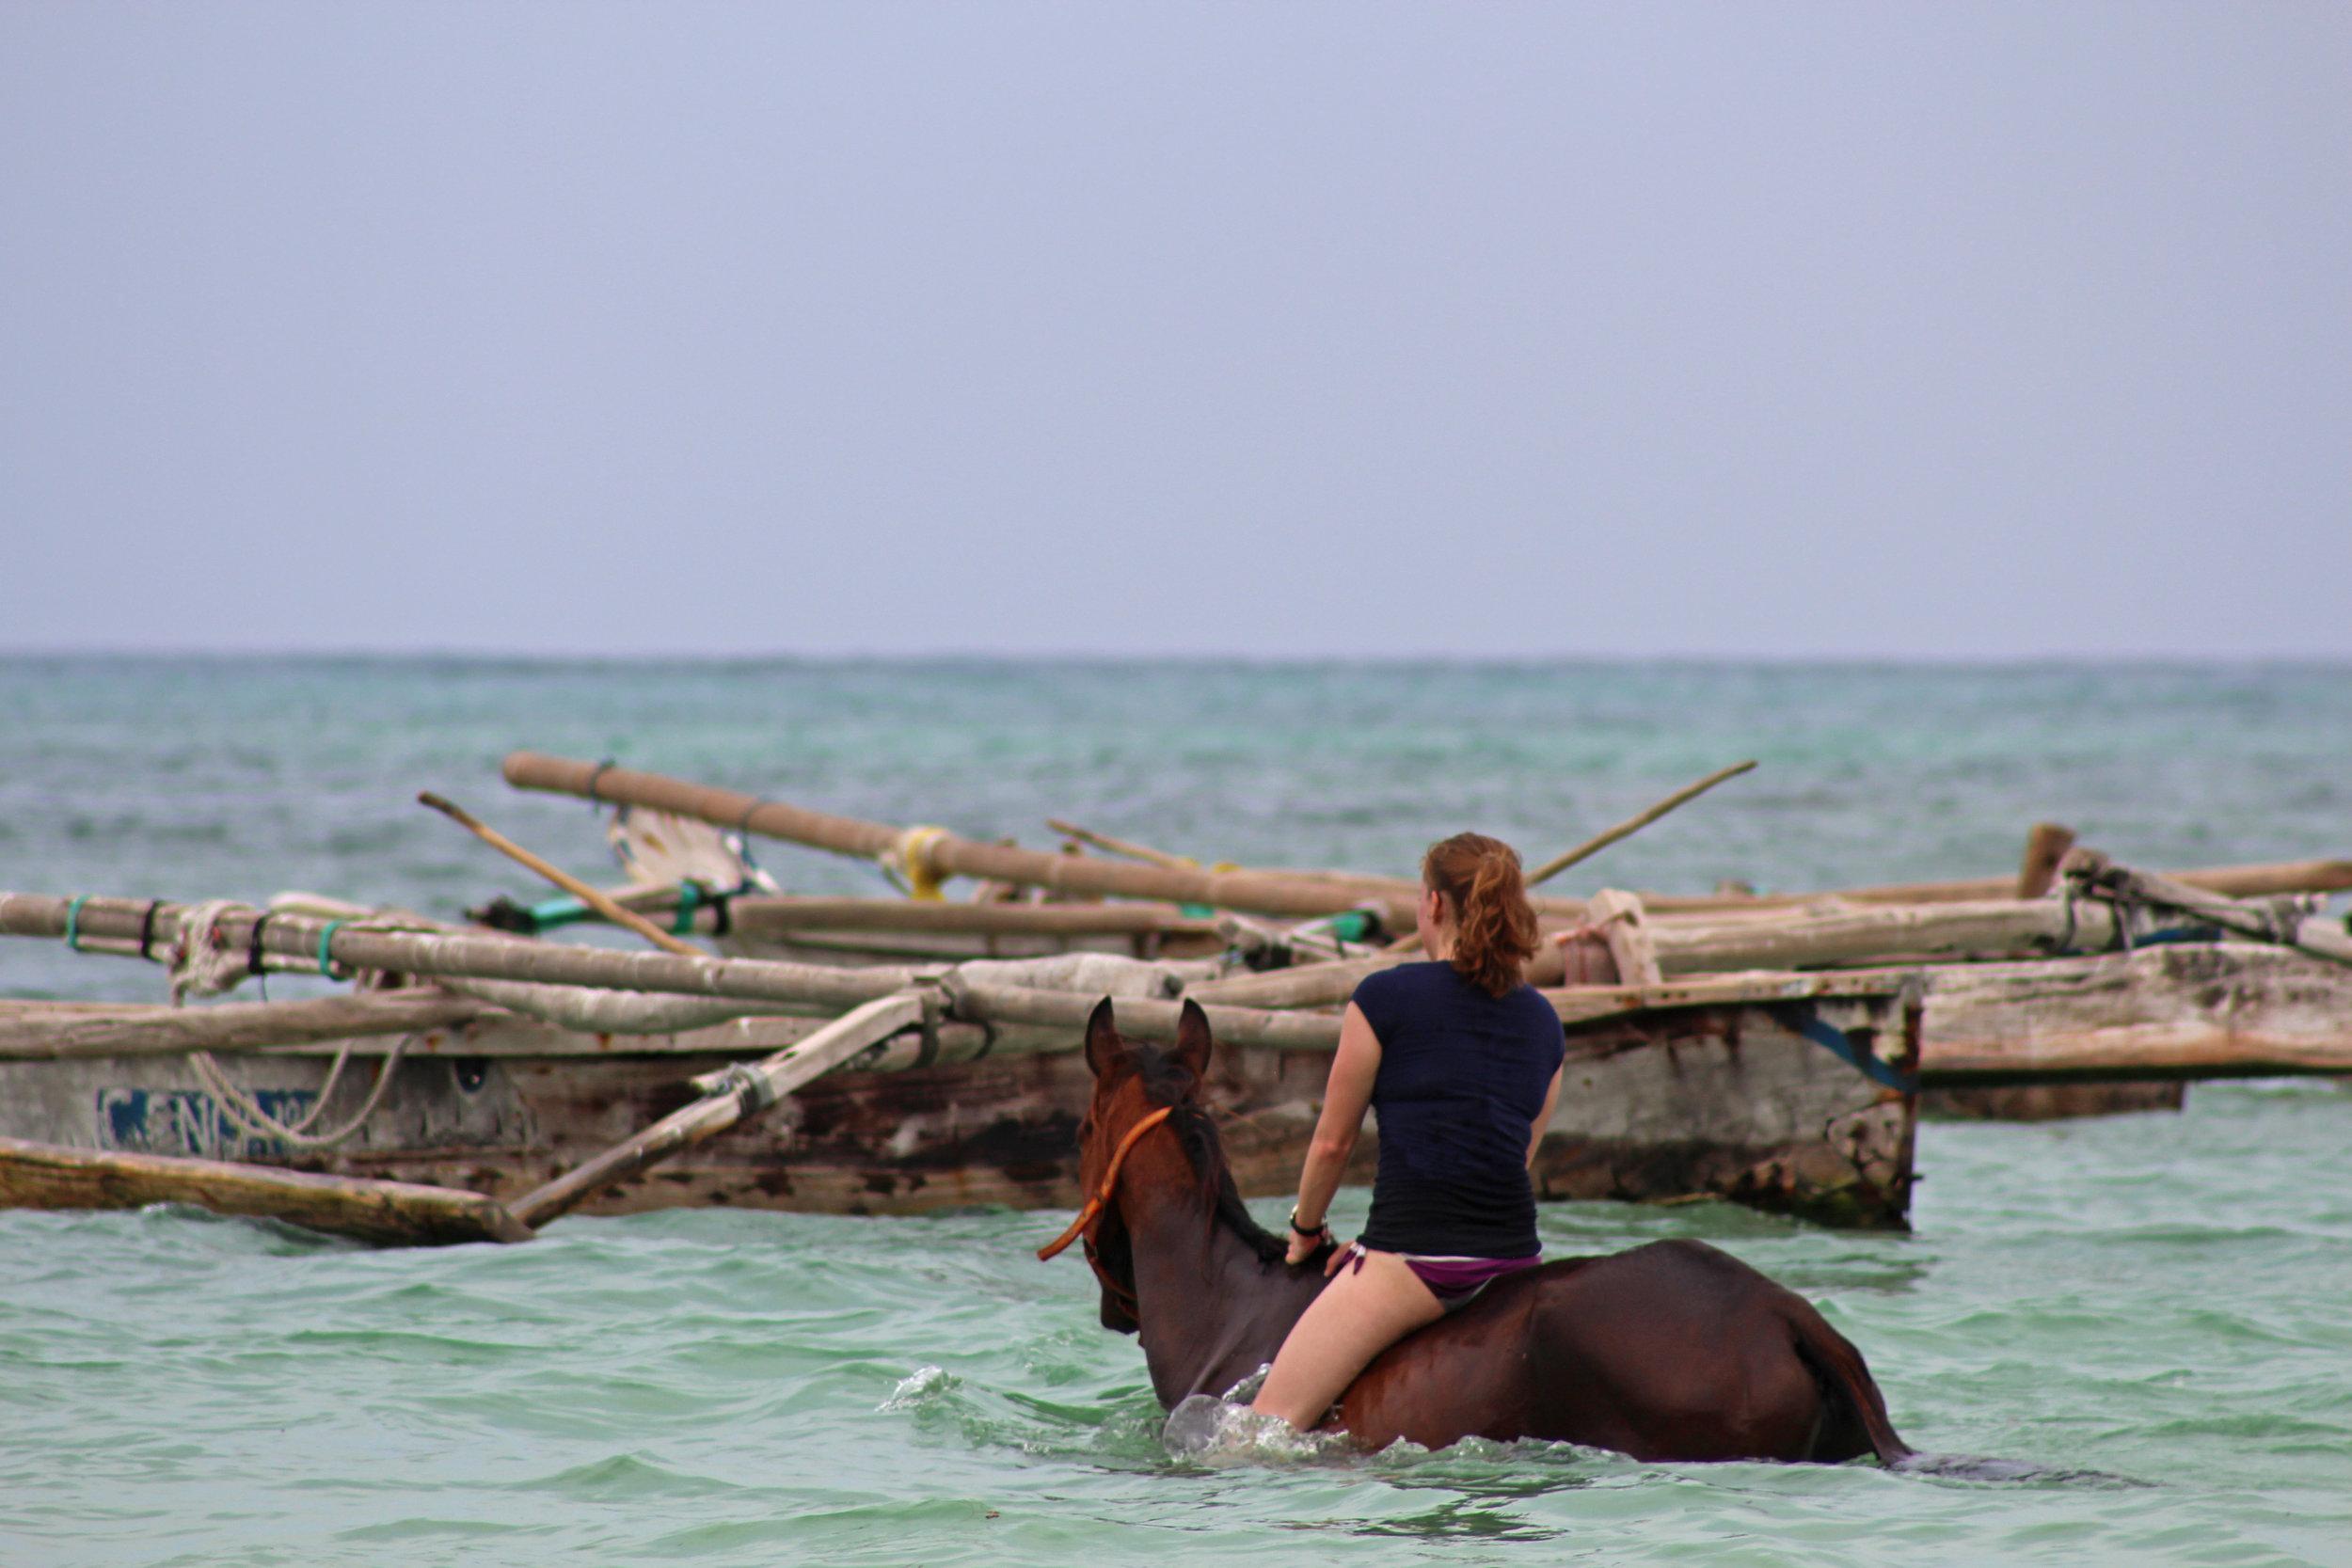 Bareback swimming on horseback in Kiwengwa, Zanzibar.